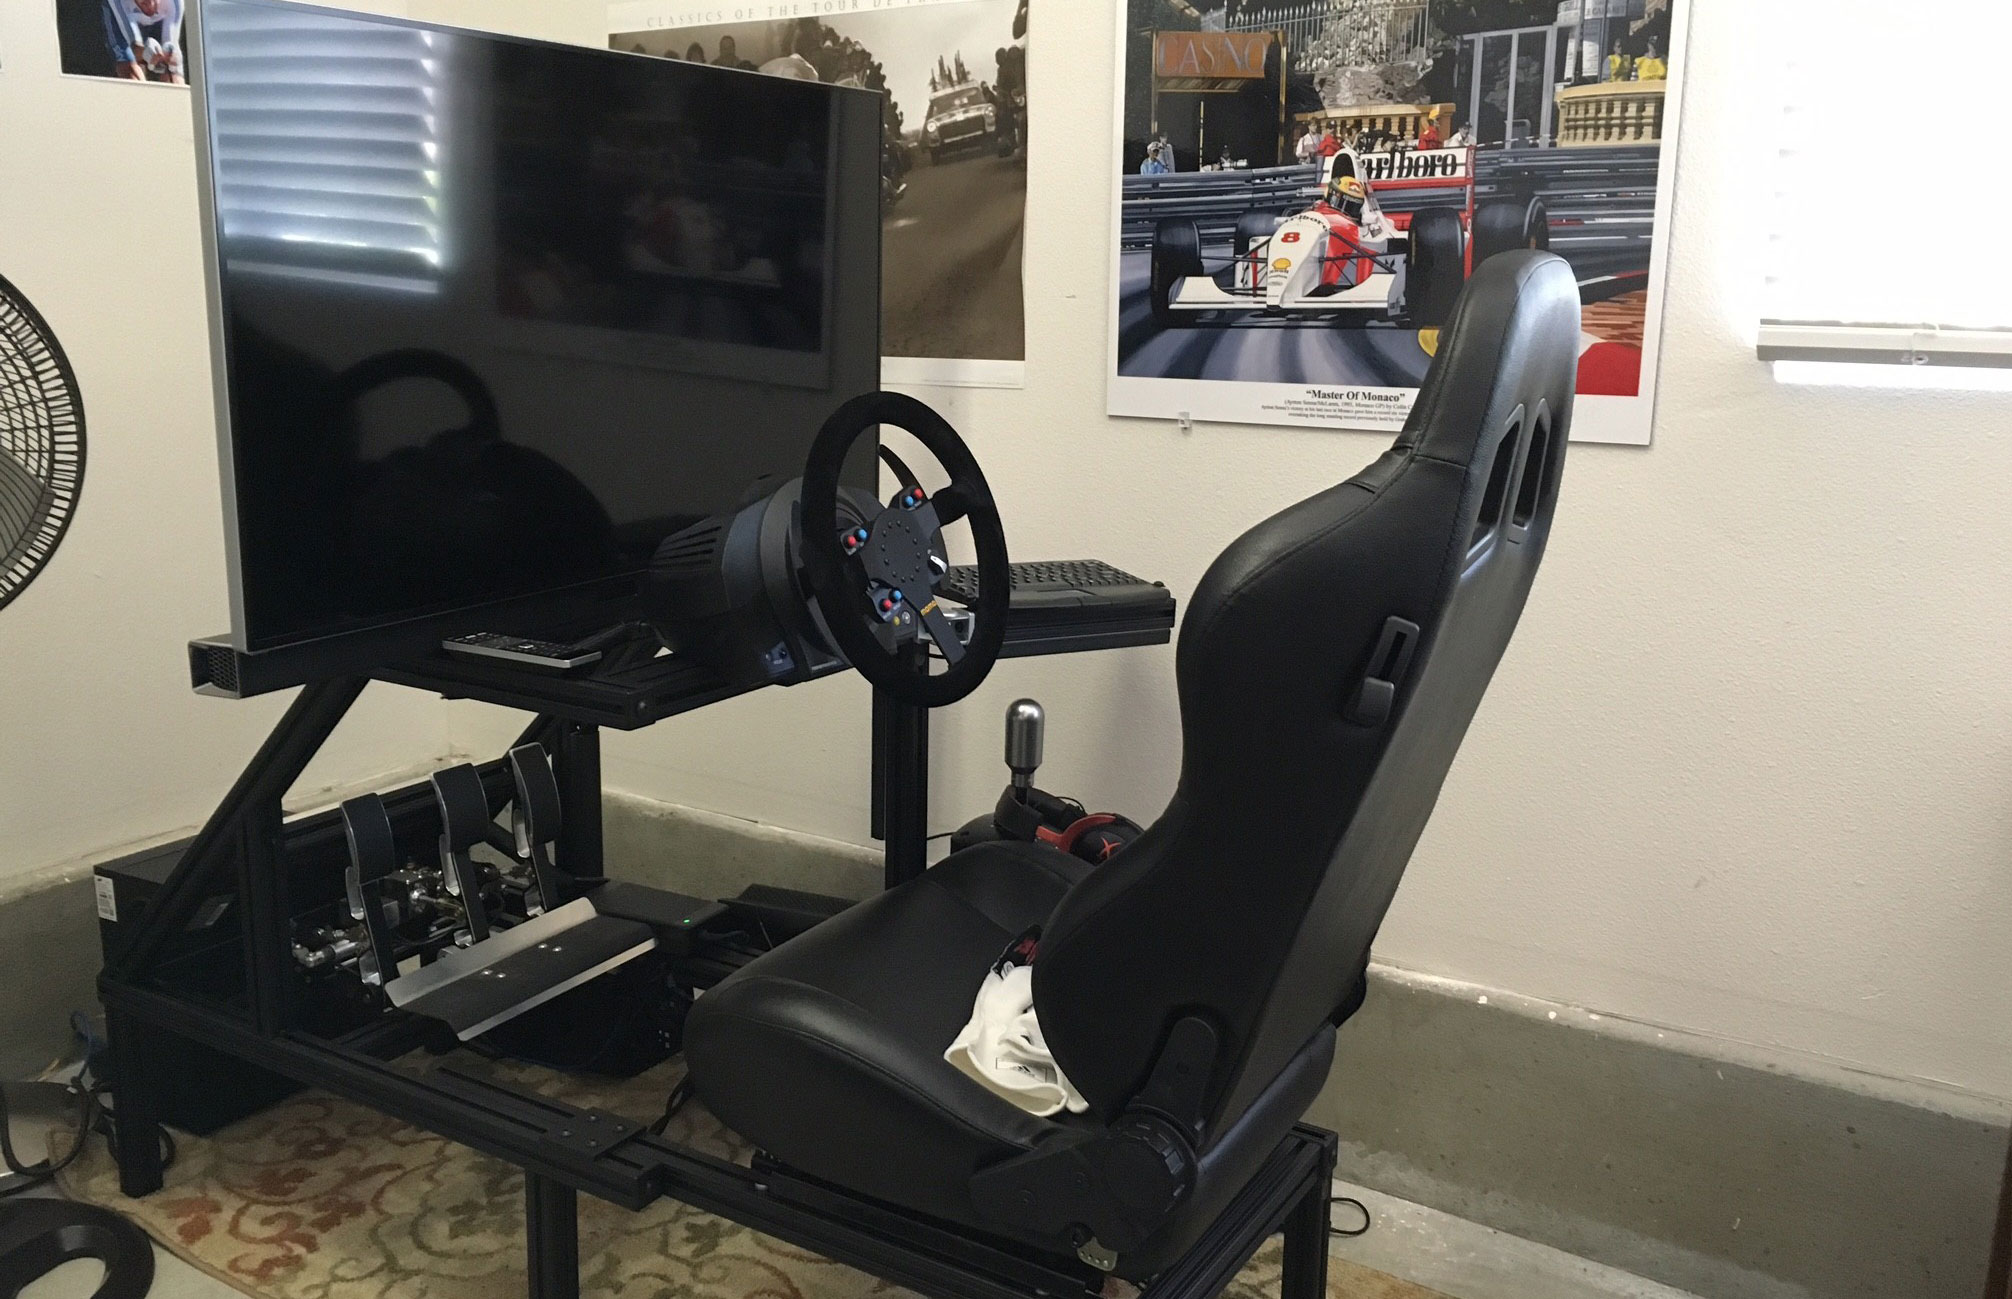 Peter Attia's Racing Simulator